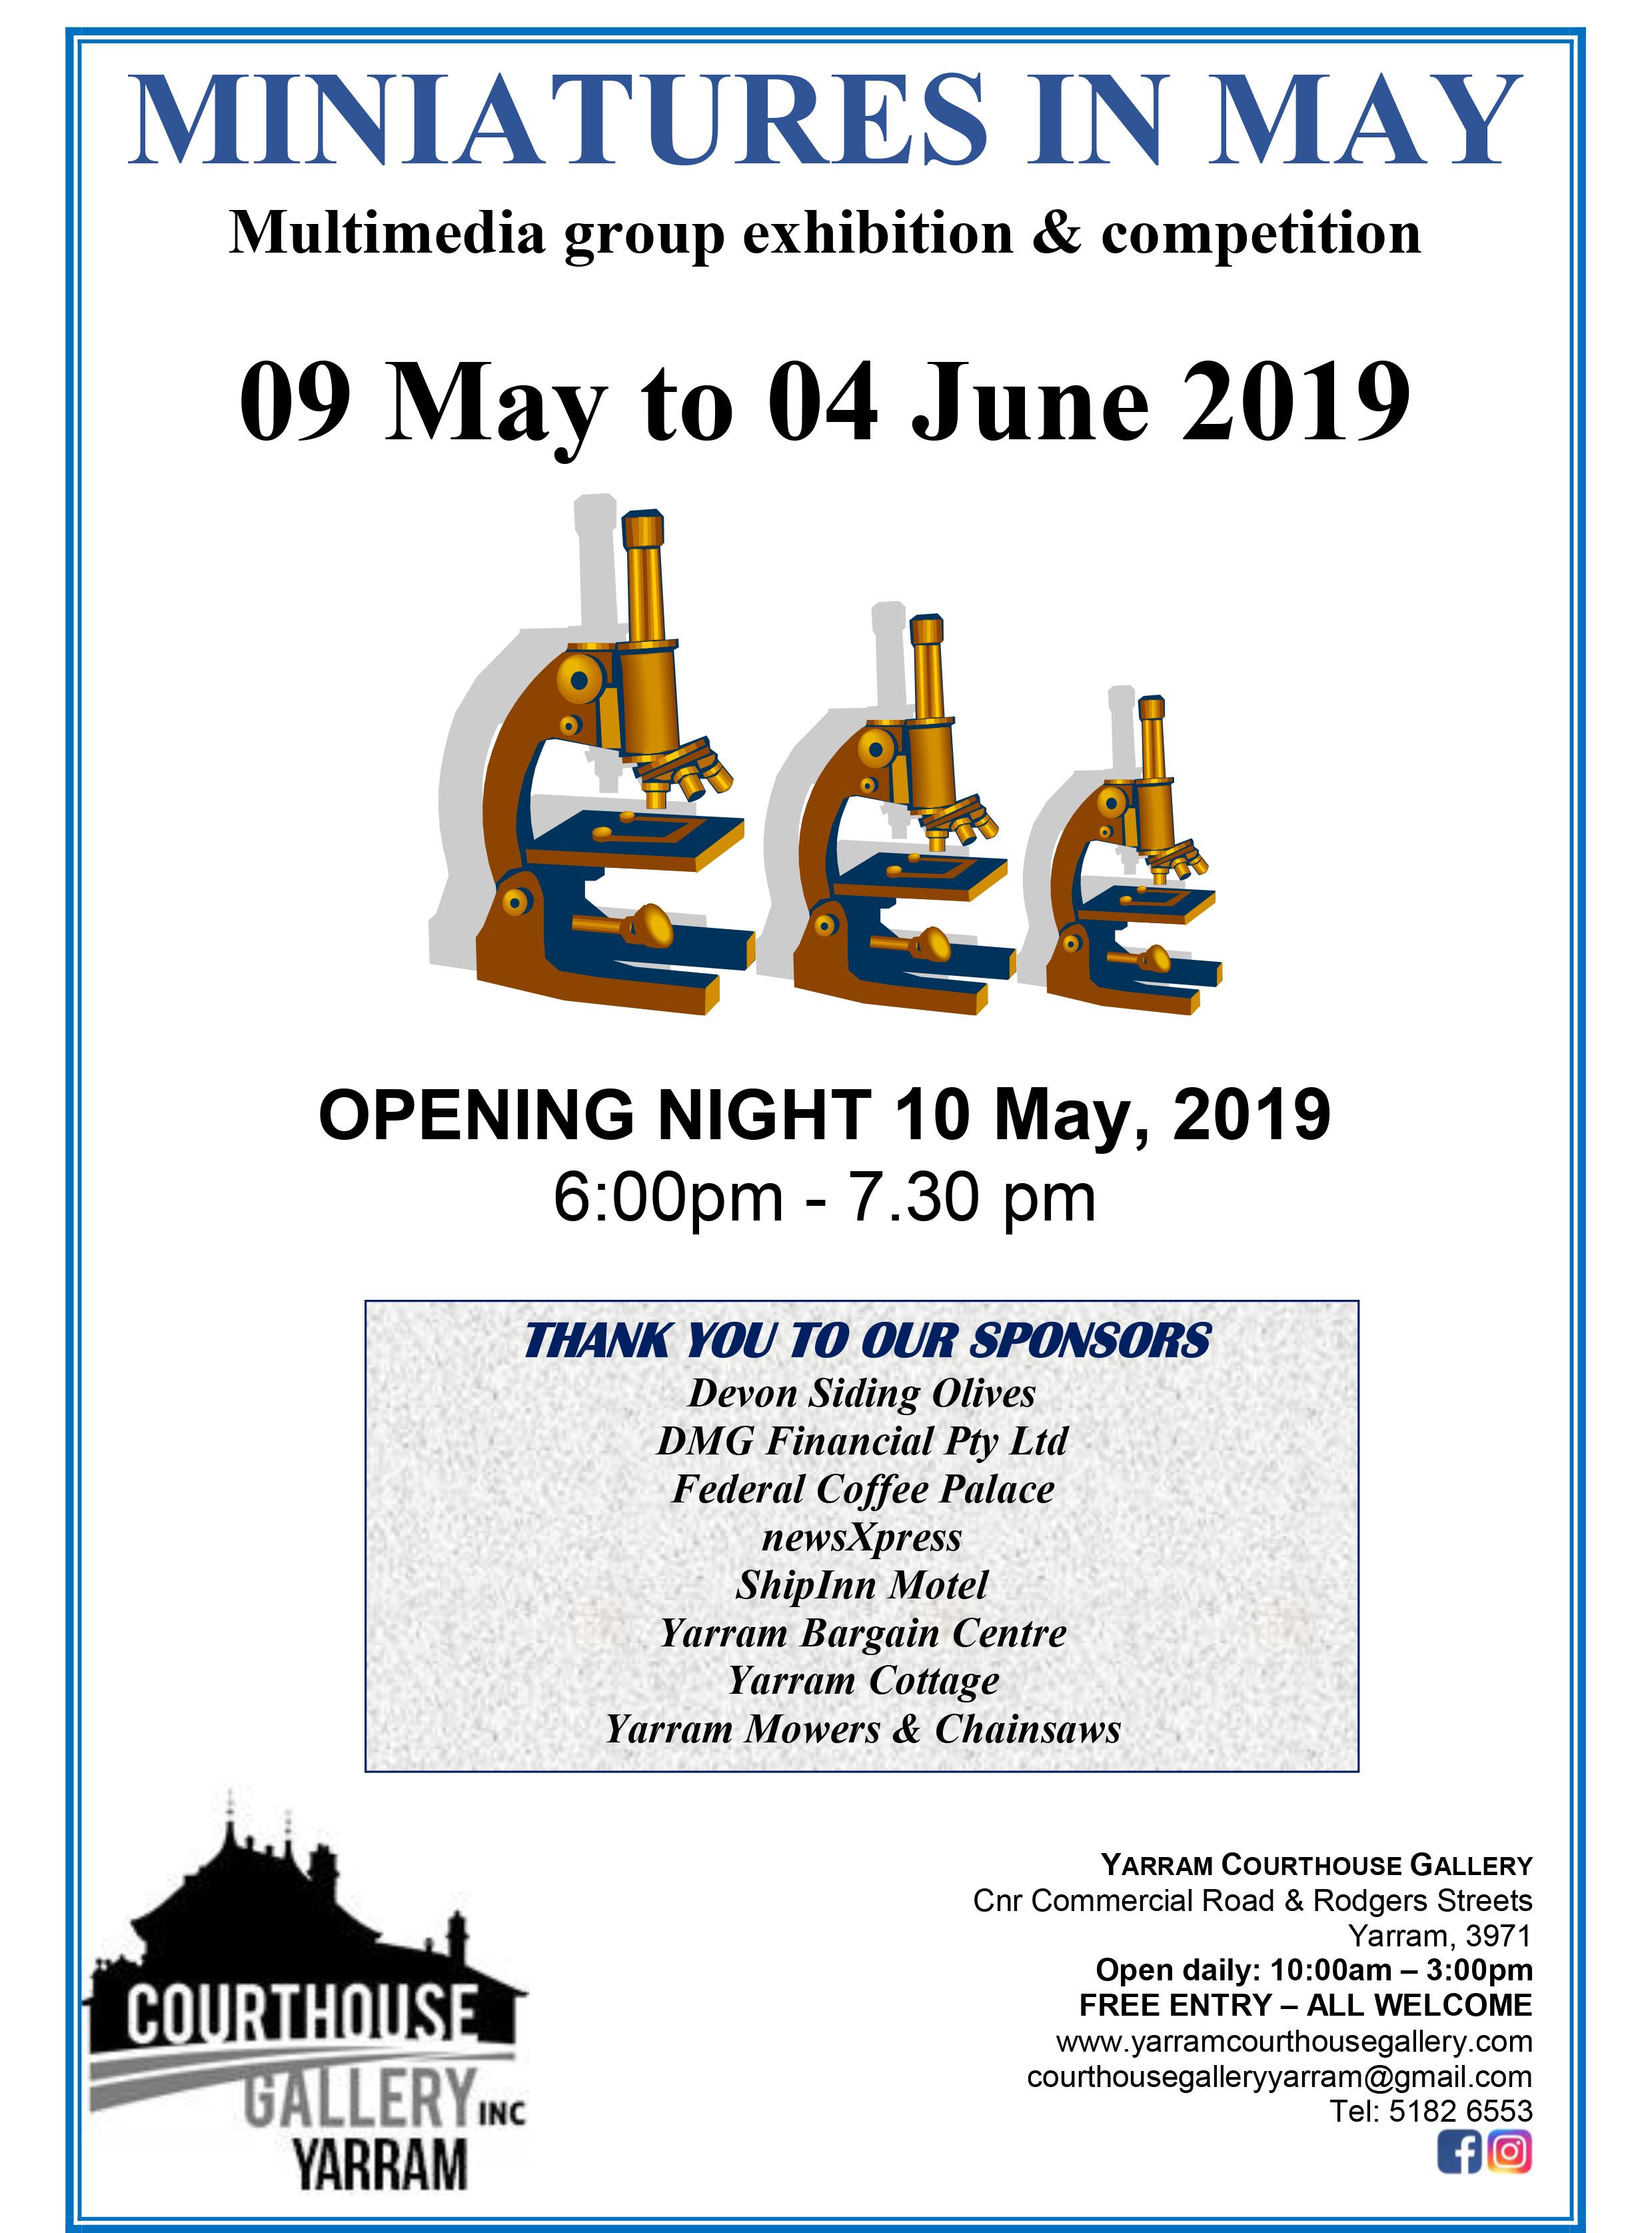 Miniatures in May 2019 poster v2 KR KB.jpg